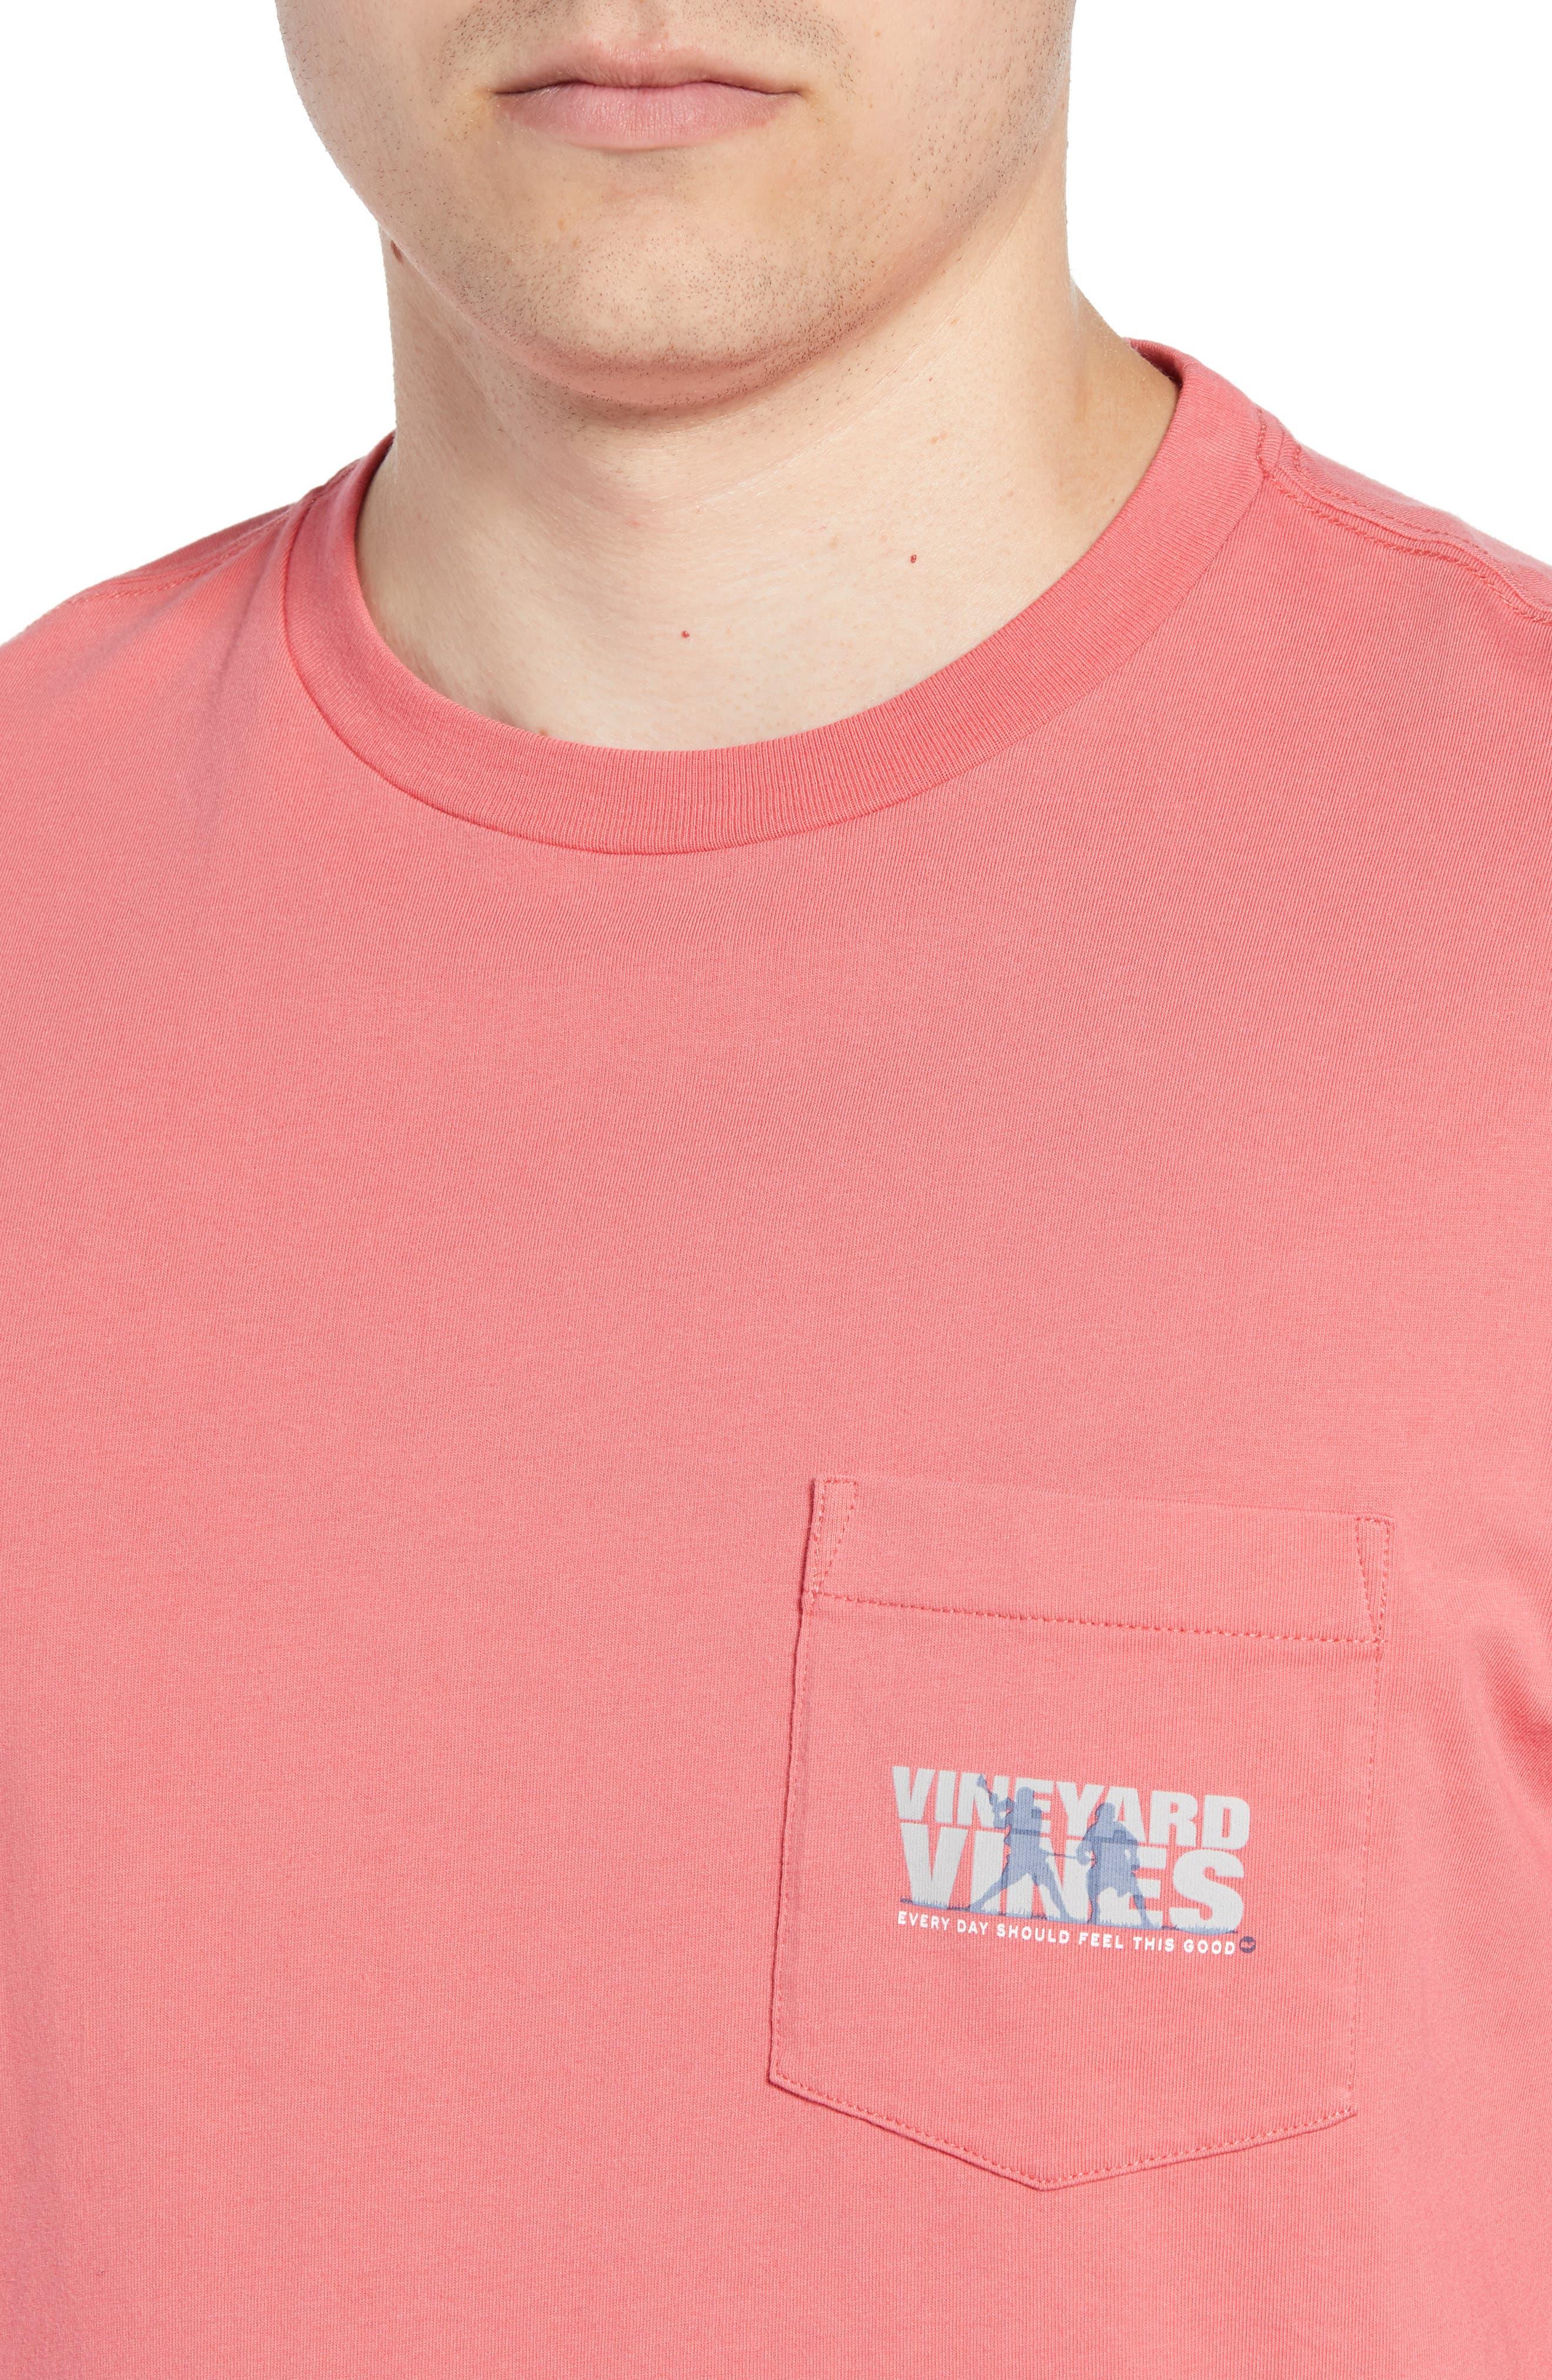 Knockout Lacrosse Pocket T-Shirt,                             Alternate thumbnail 4, color,                             SAILORS RED